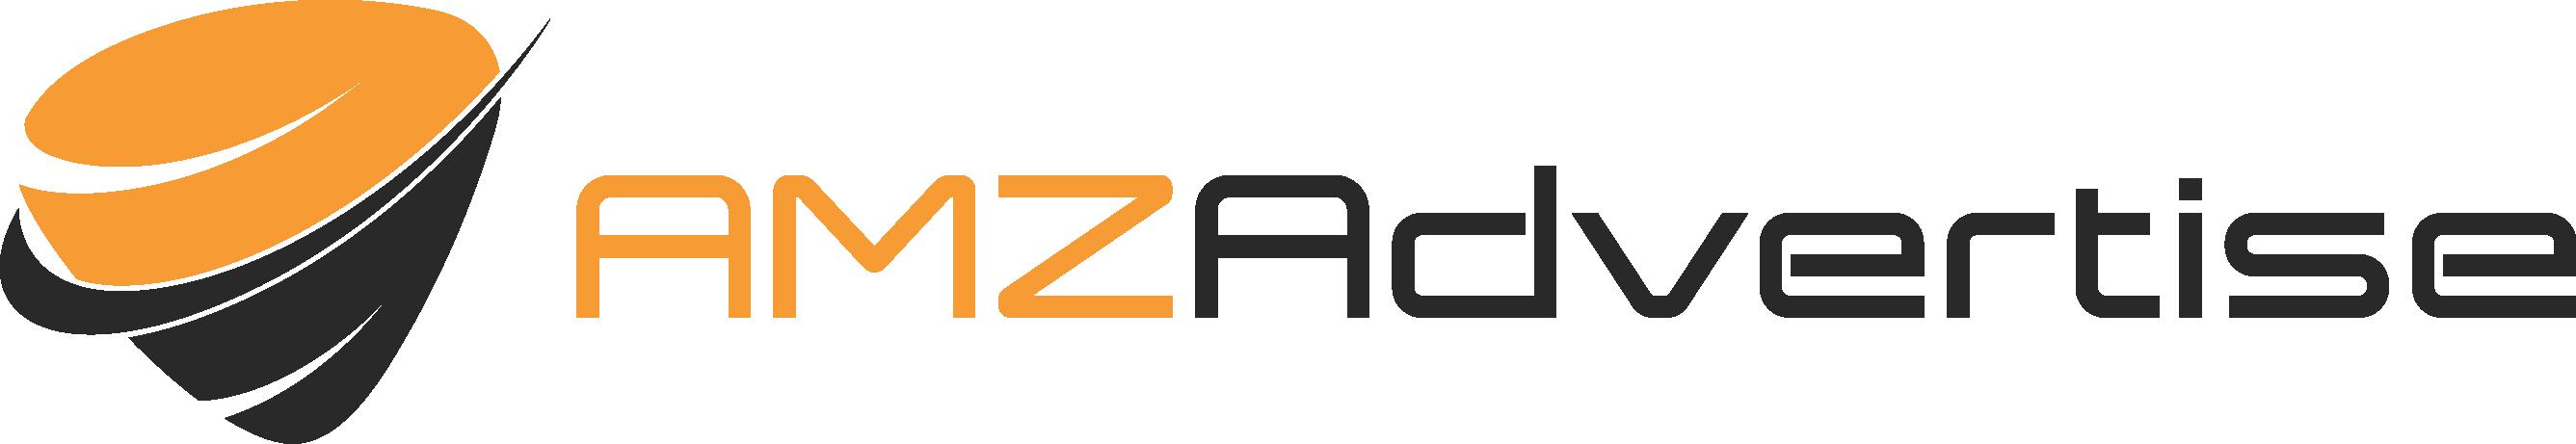 Amz-Advertise